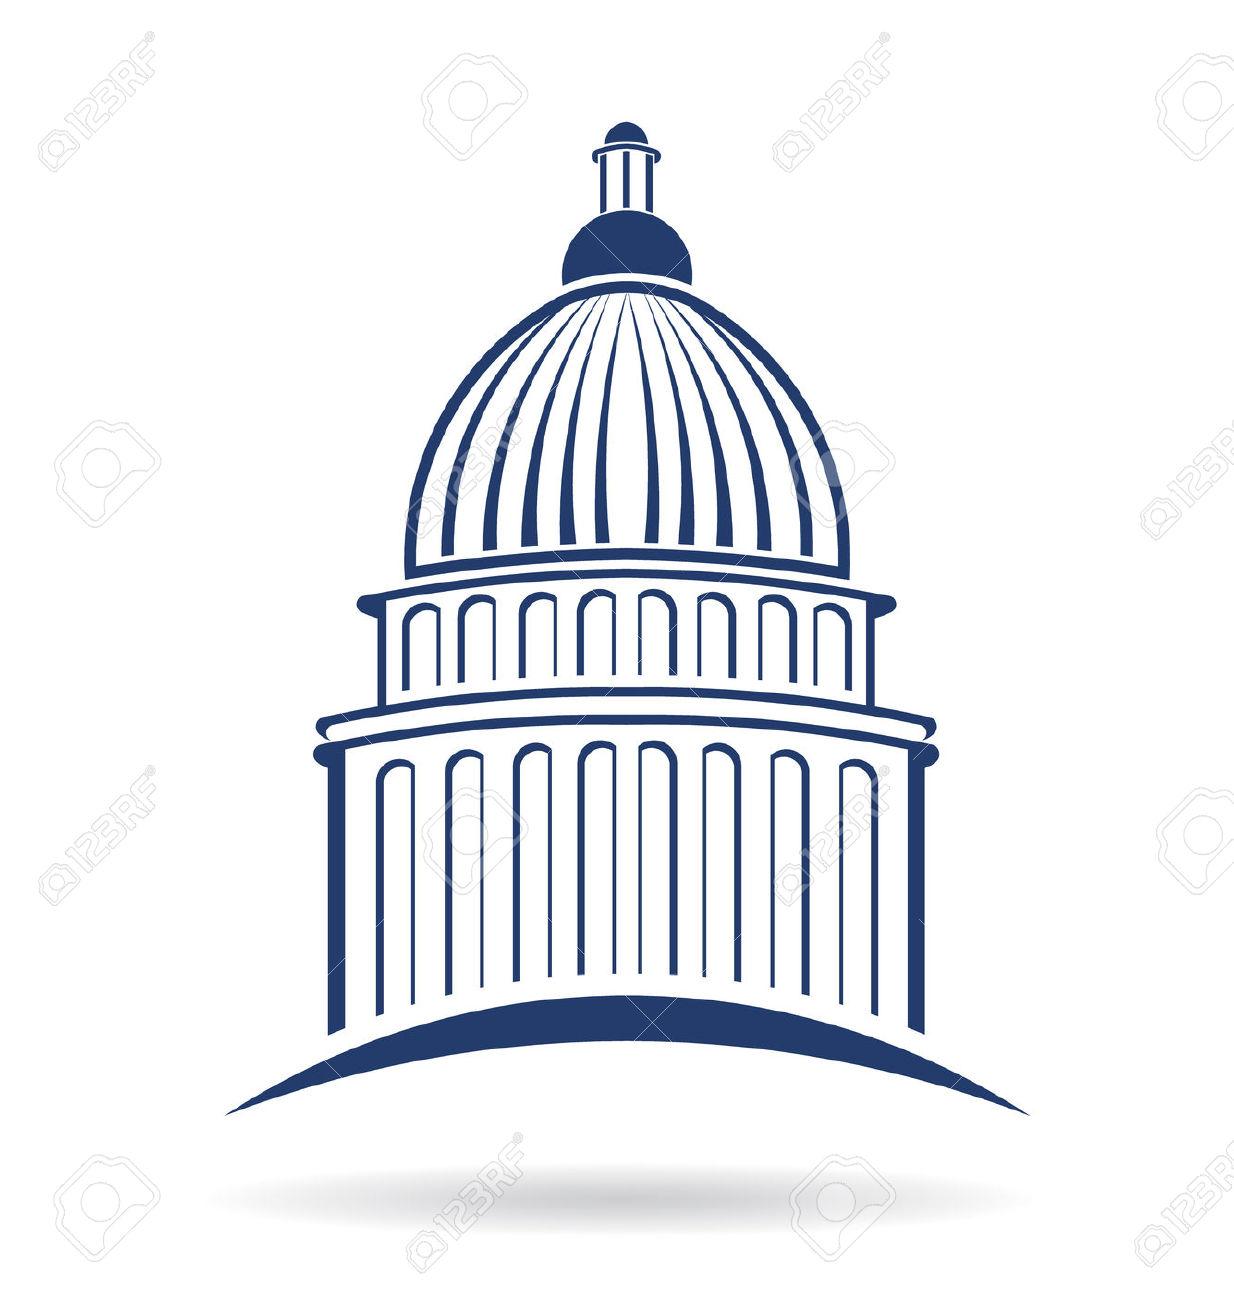 1234x1300 Capitol Building Clipart Png